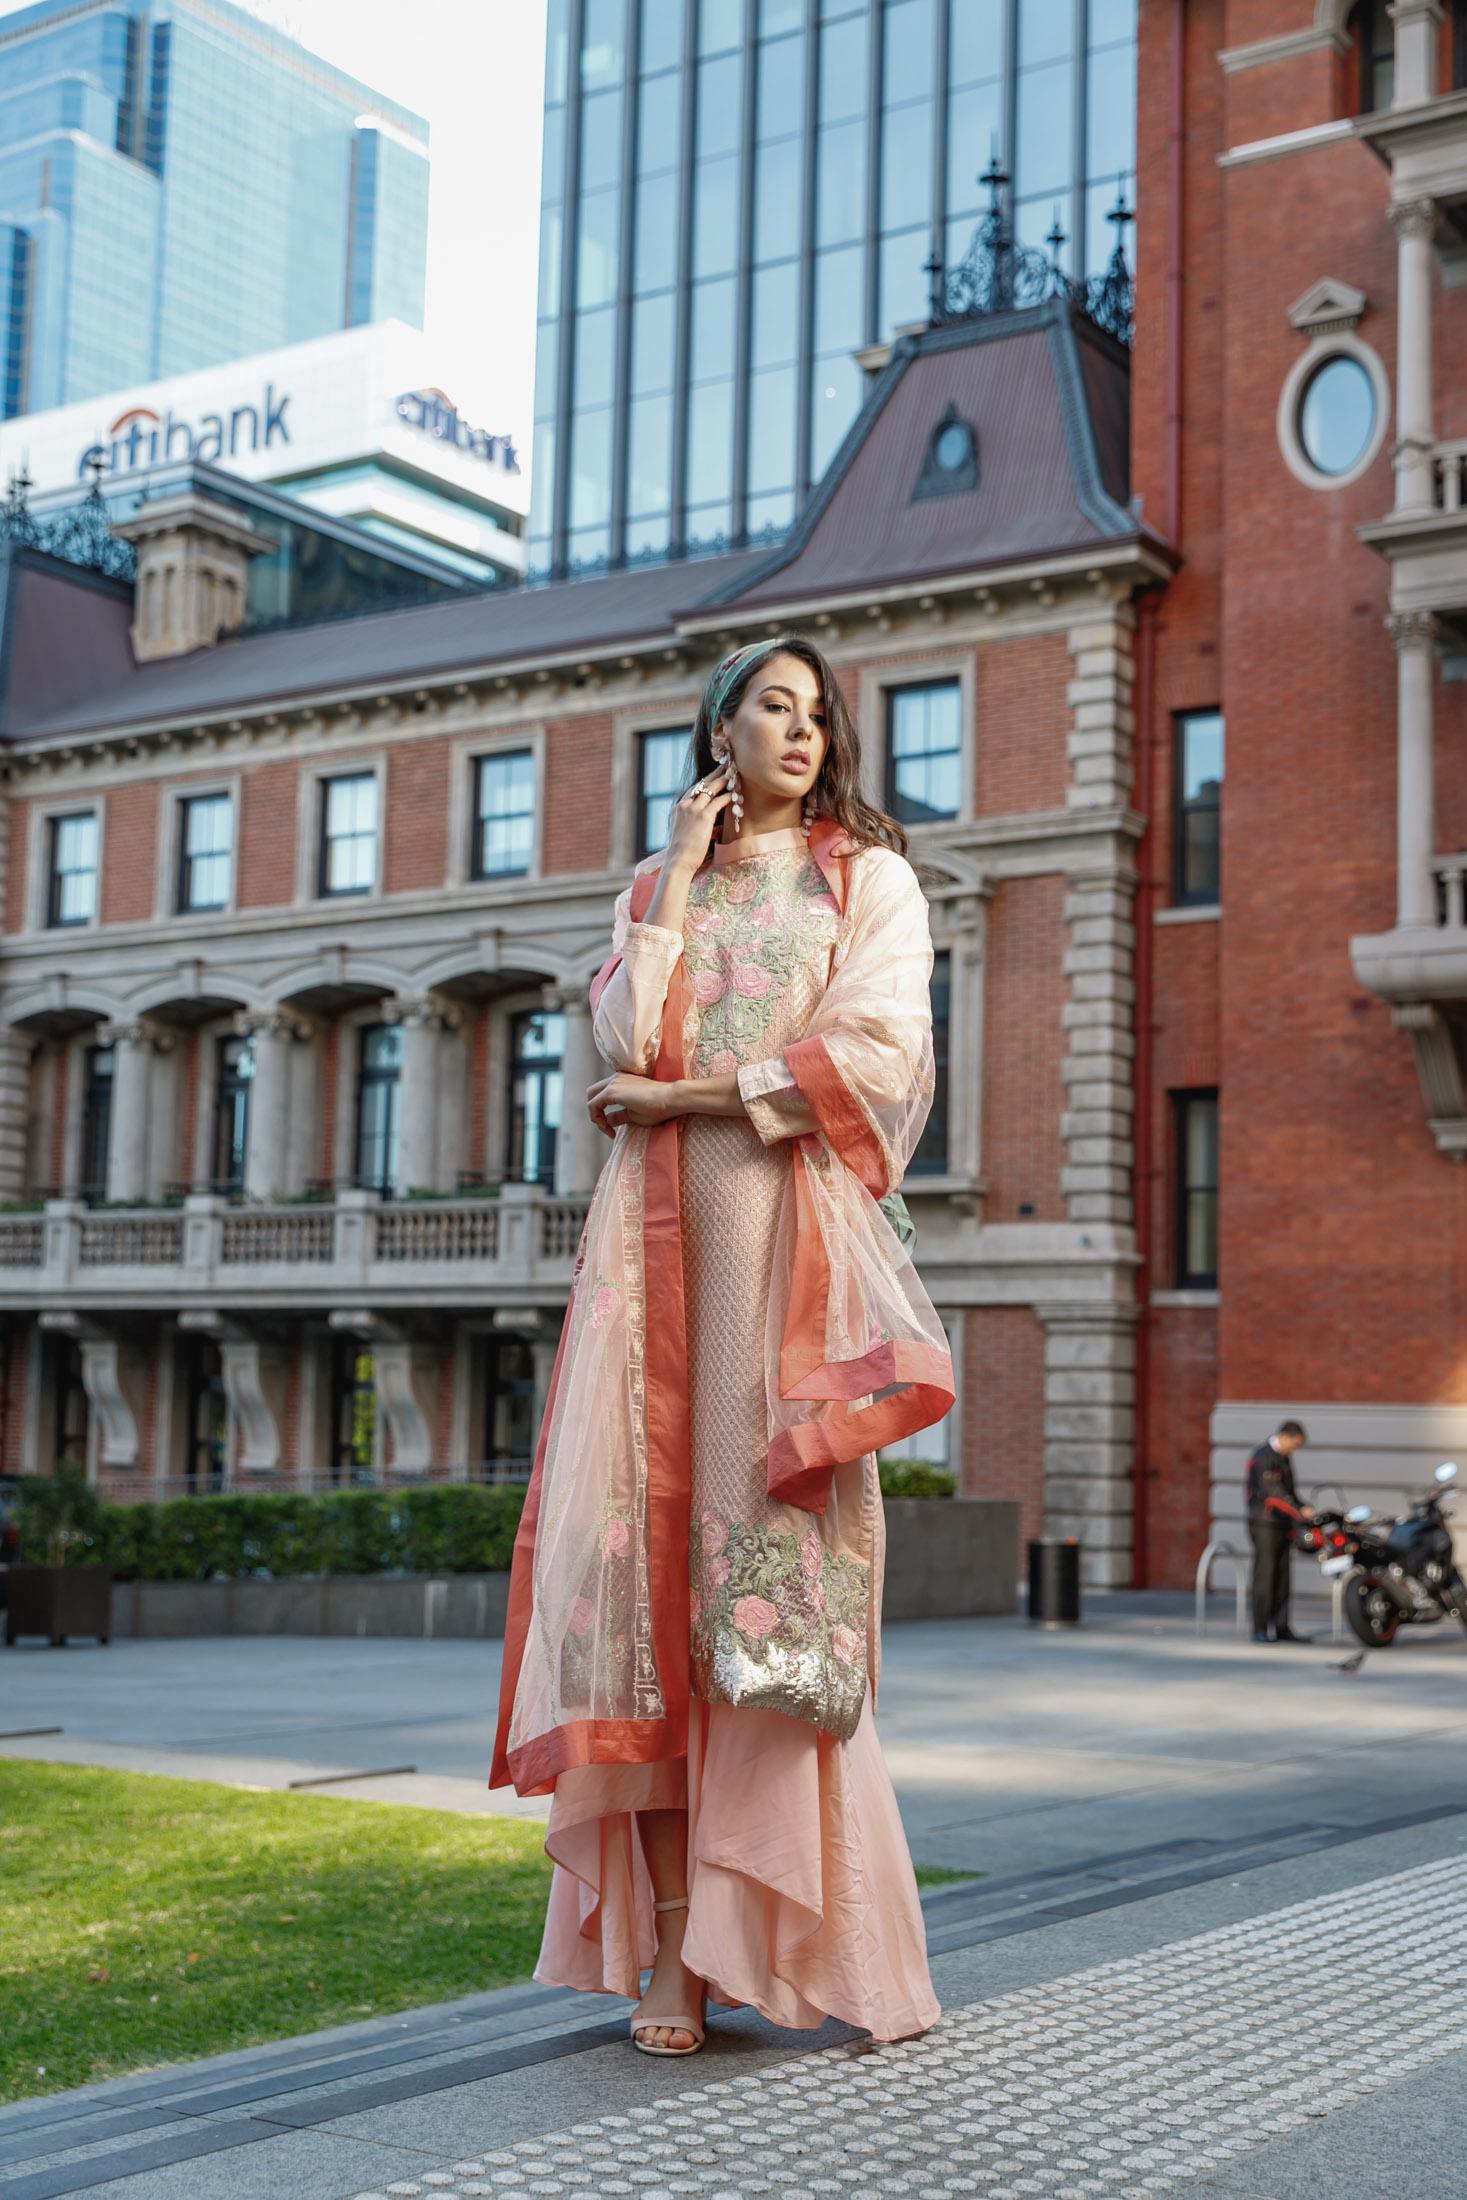 Ammon_Creative-Fashion_Photography-Vogue_Sultana_Bangladesh-Old_Treasury-Perth-006-1259.jpg